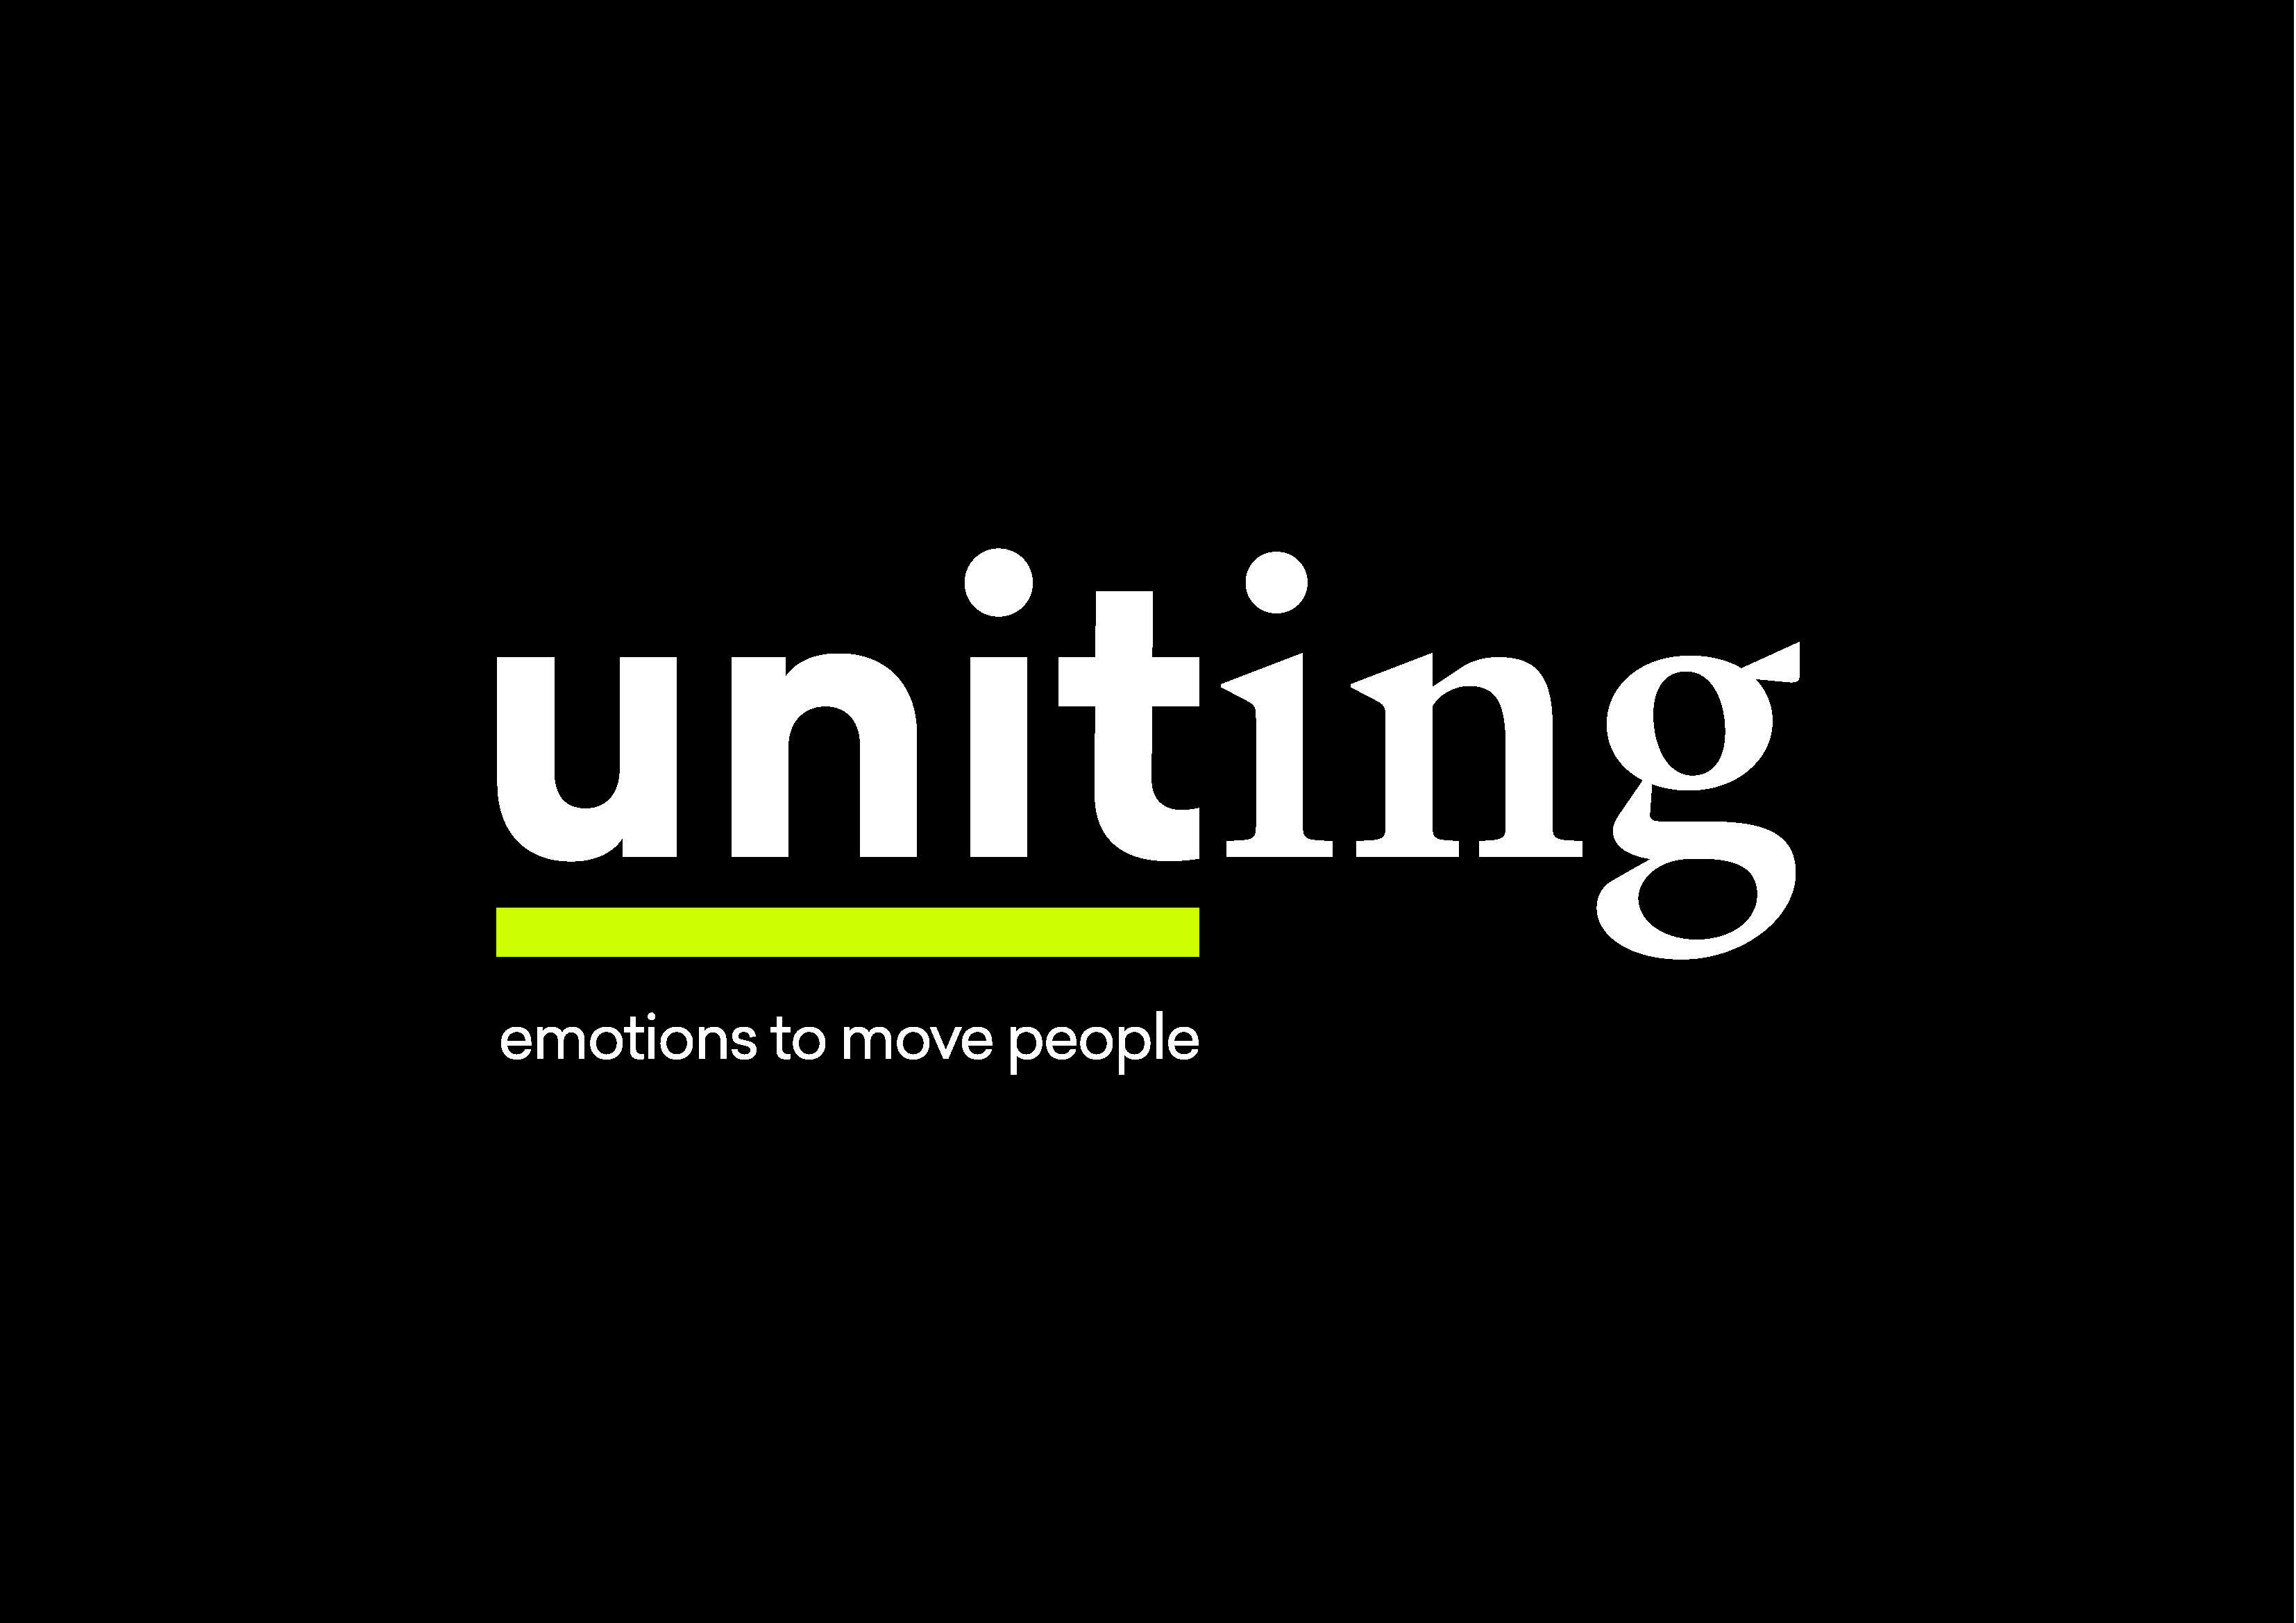 Uniting